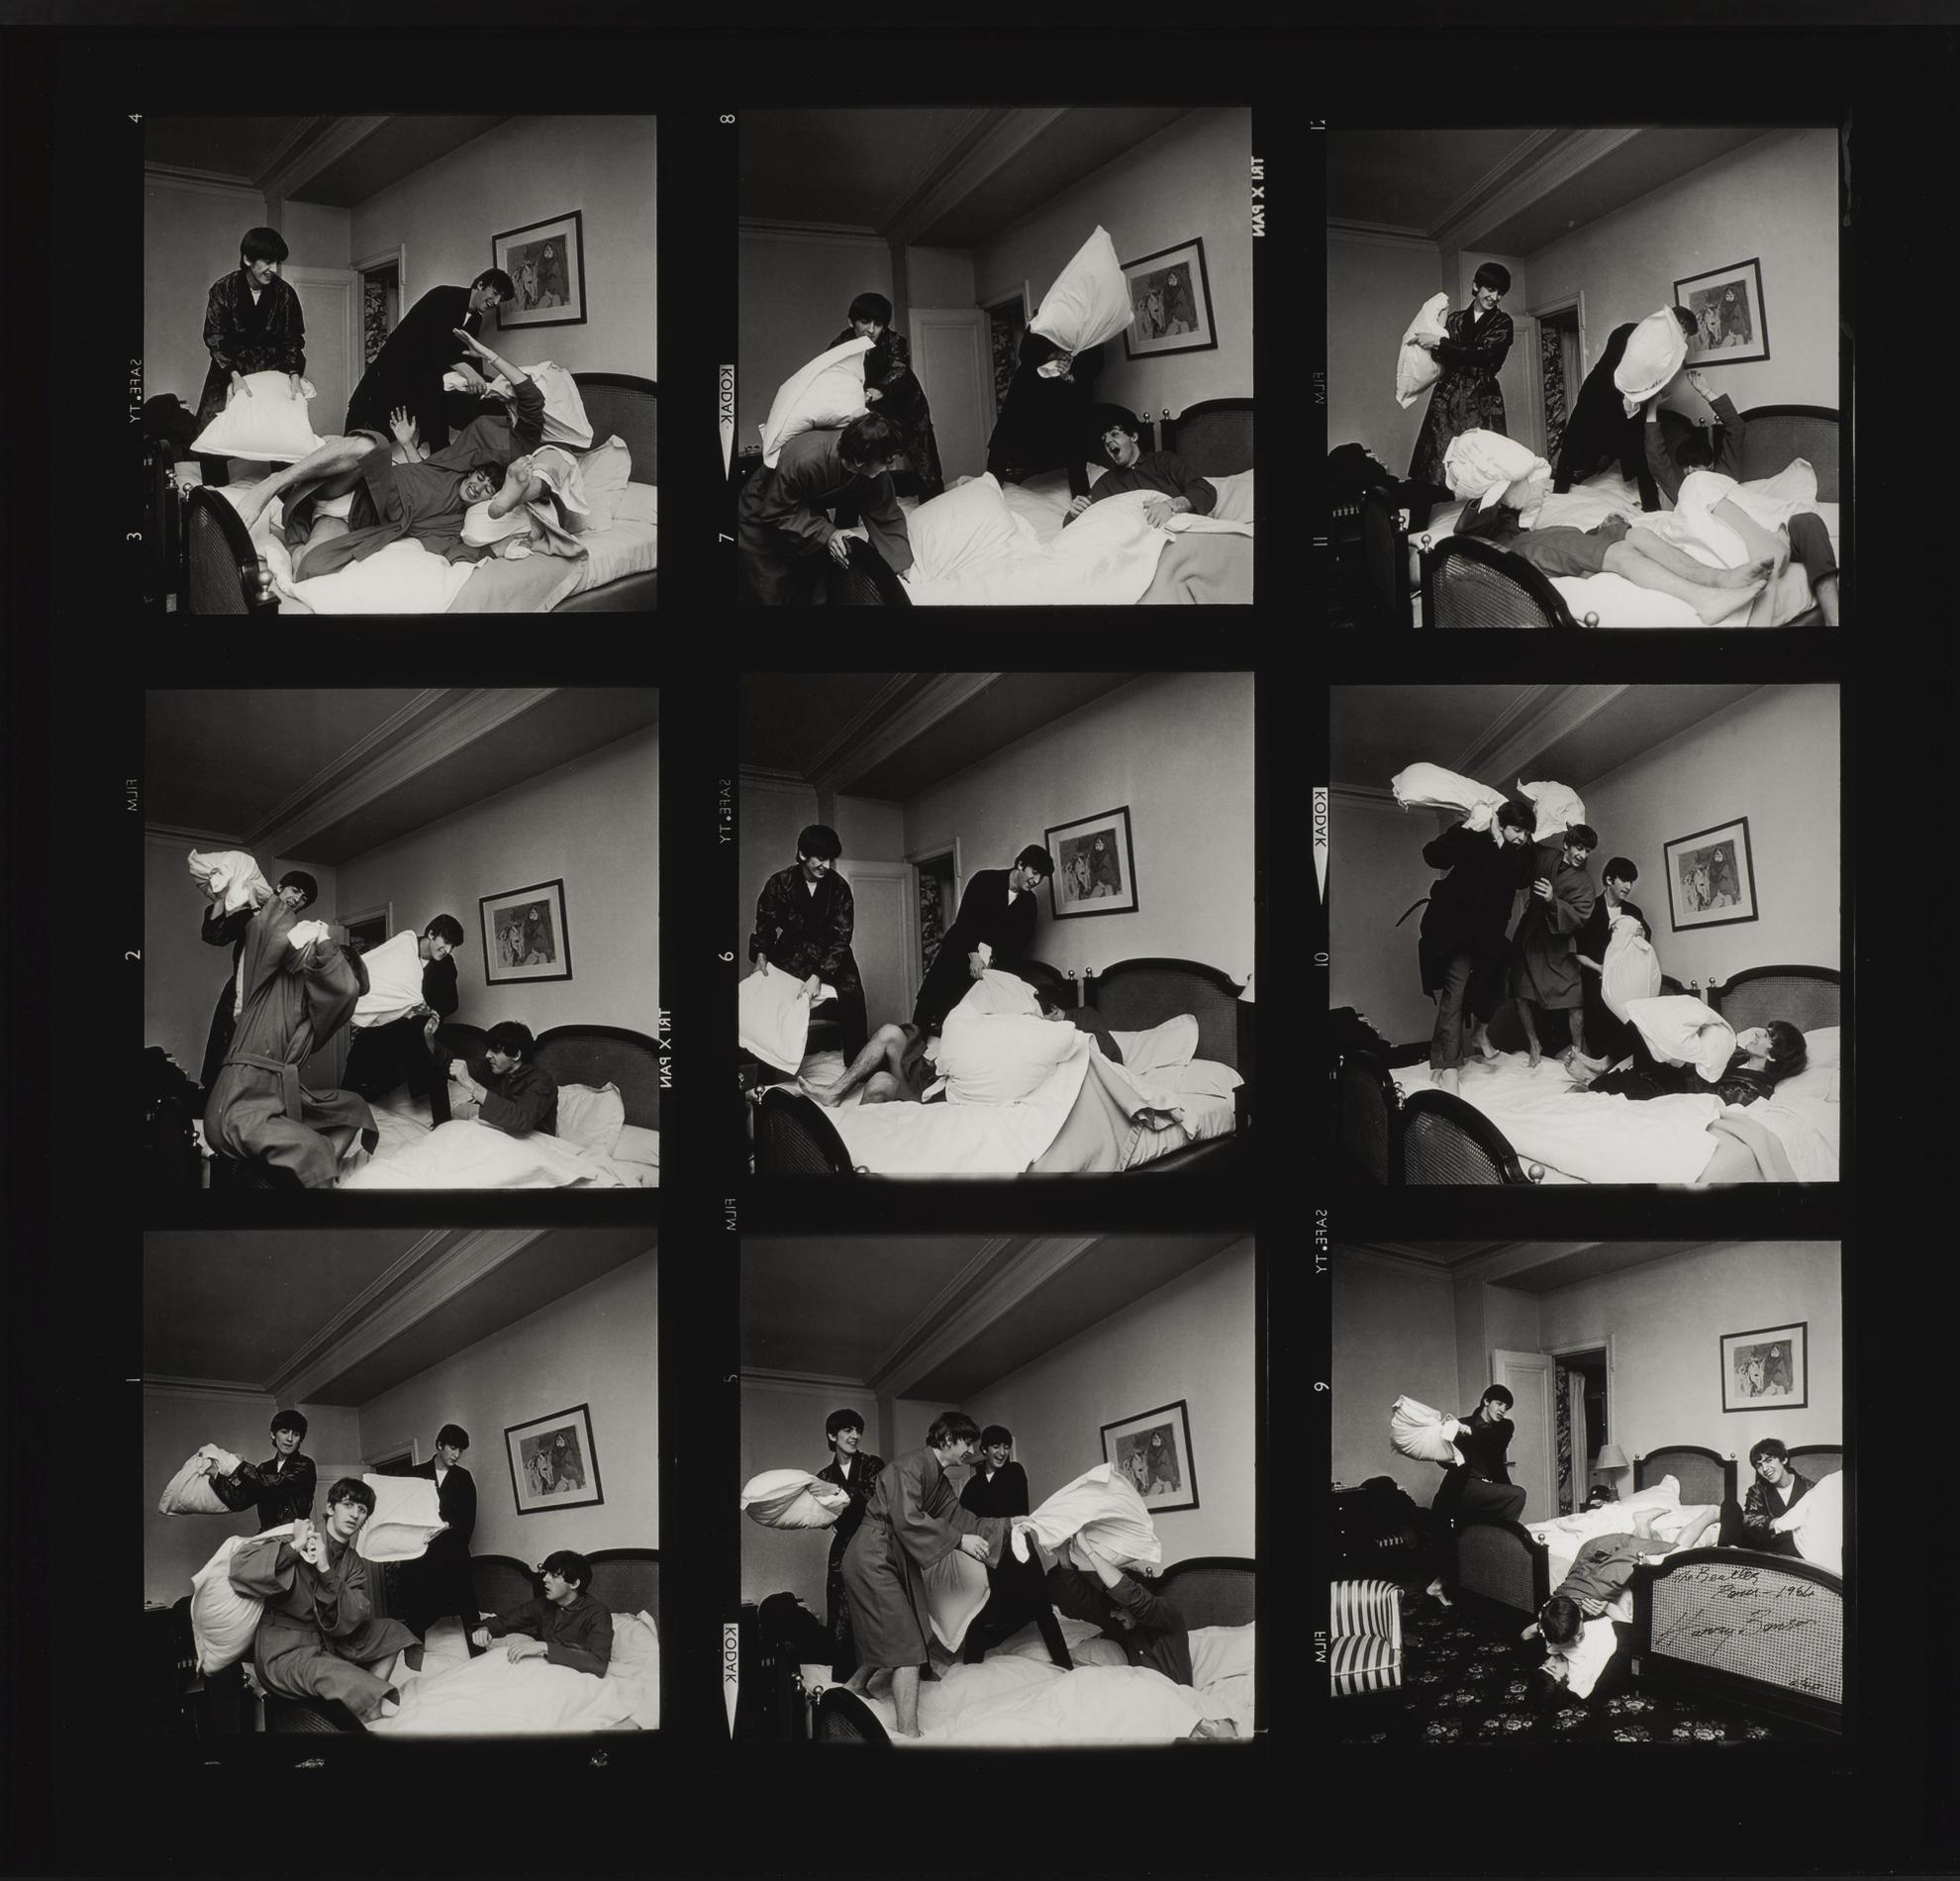 Harry Benson - The Beatles, Paris (Pillow Fight)-1964